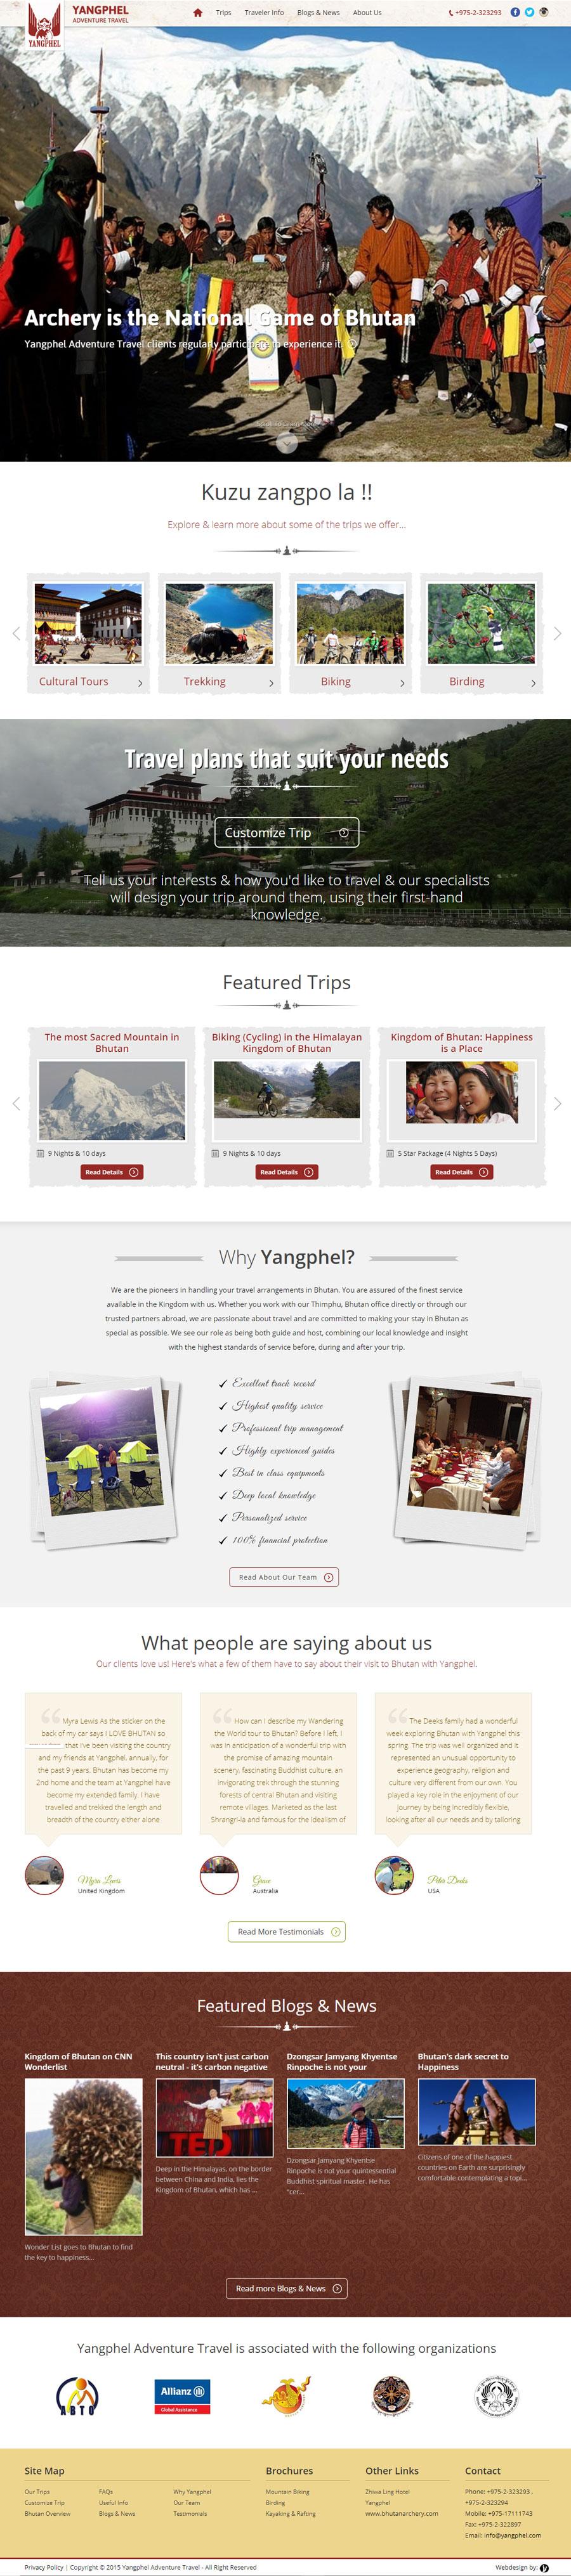 Yangphel Adventure